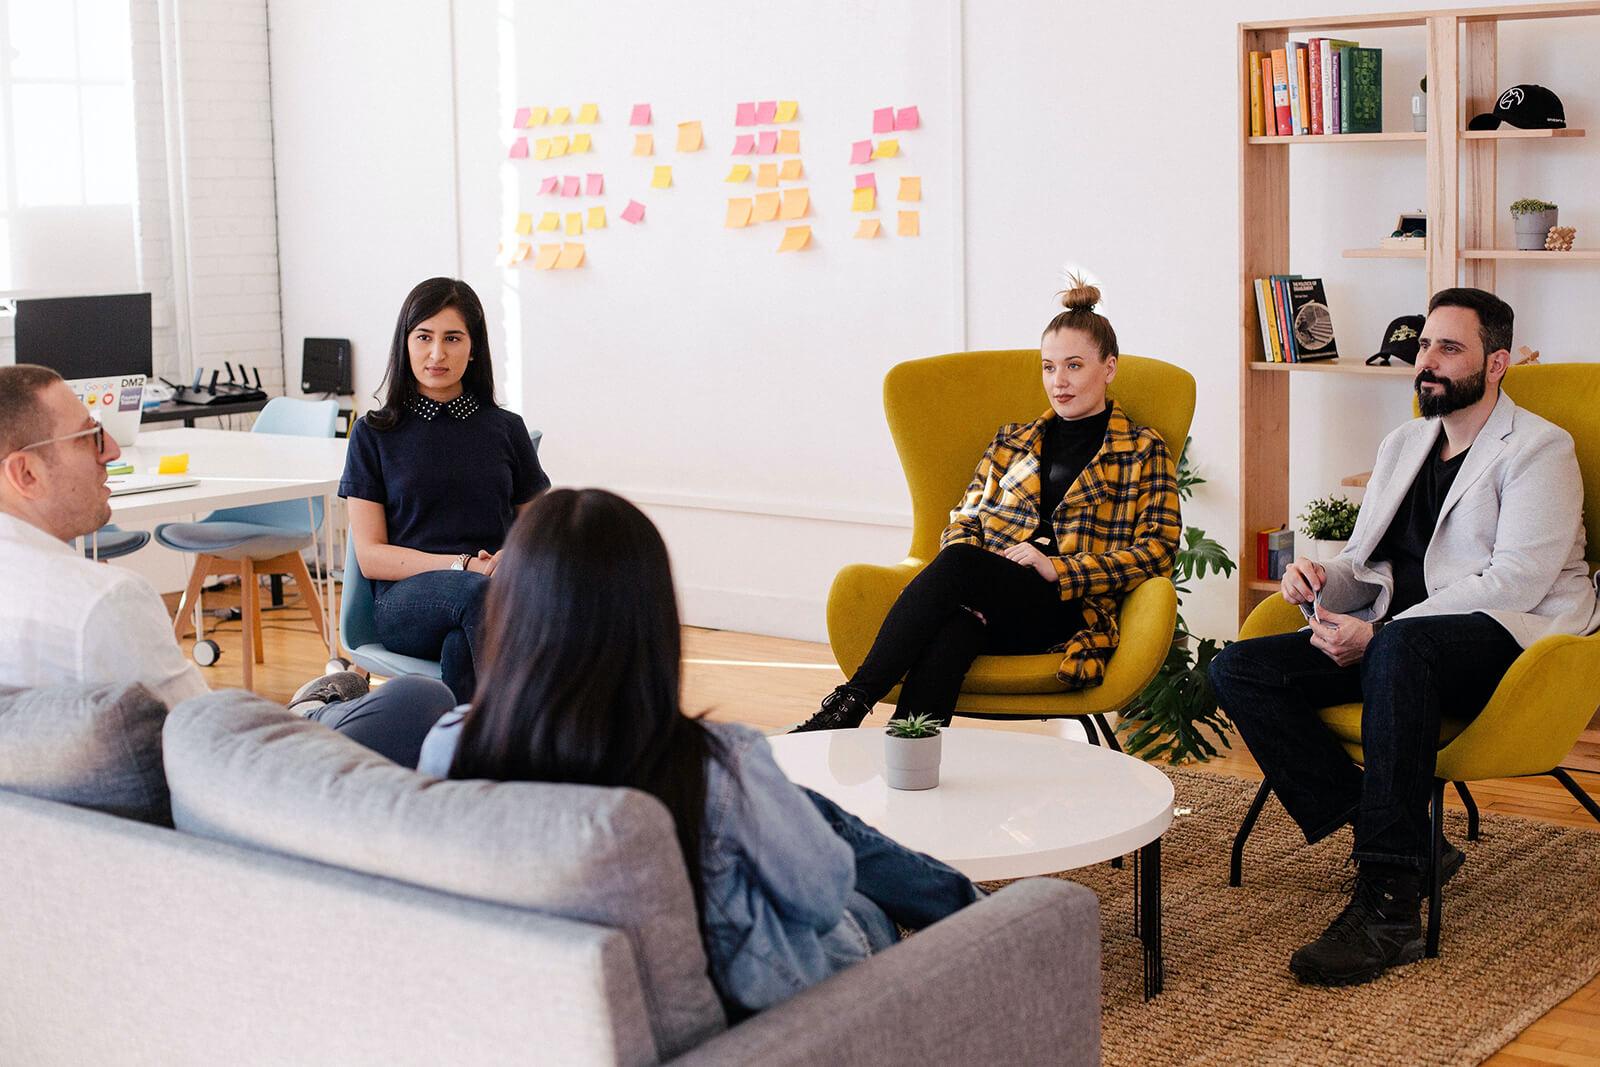 Improving Employer Branding to Recruit Top Tier Talent